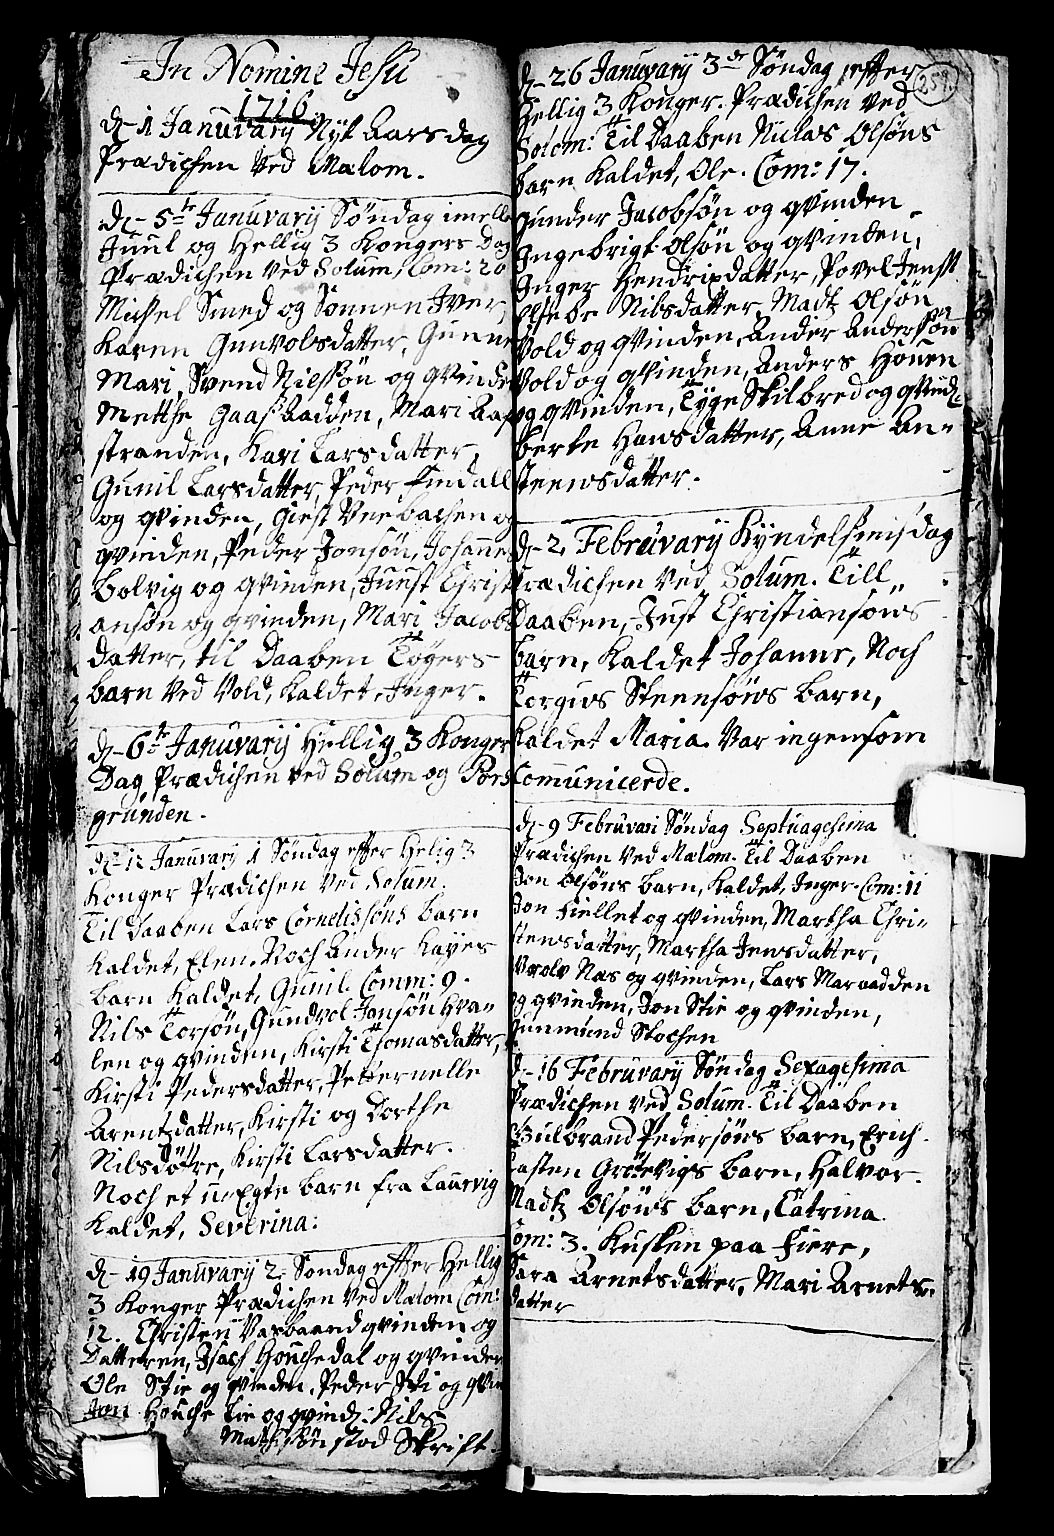 SAKO, Solum kirkebøker, F/Fa/L0001: Ministerialbok nr. I 1, 1701-1716, s. 259